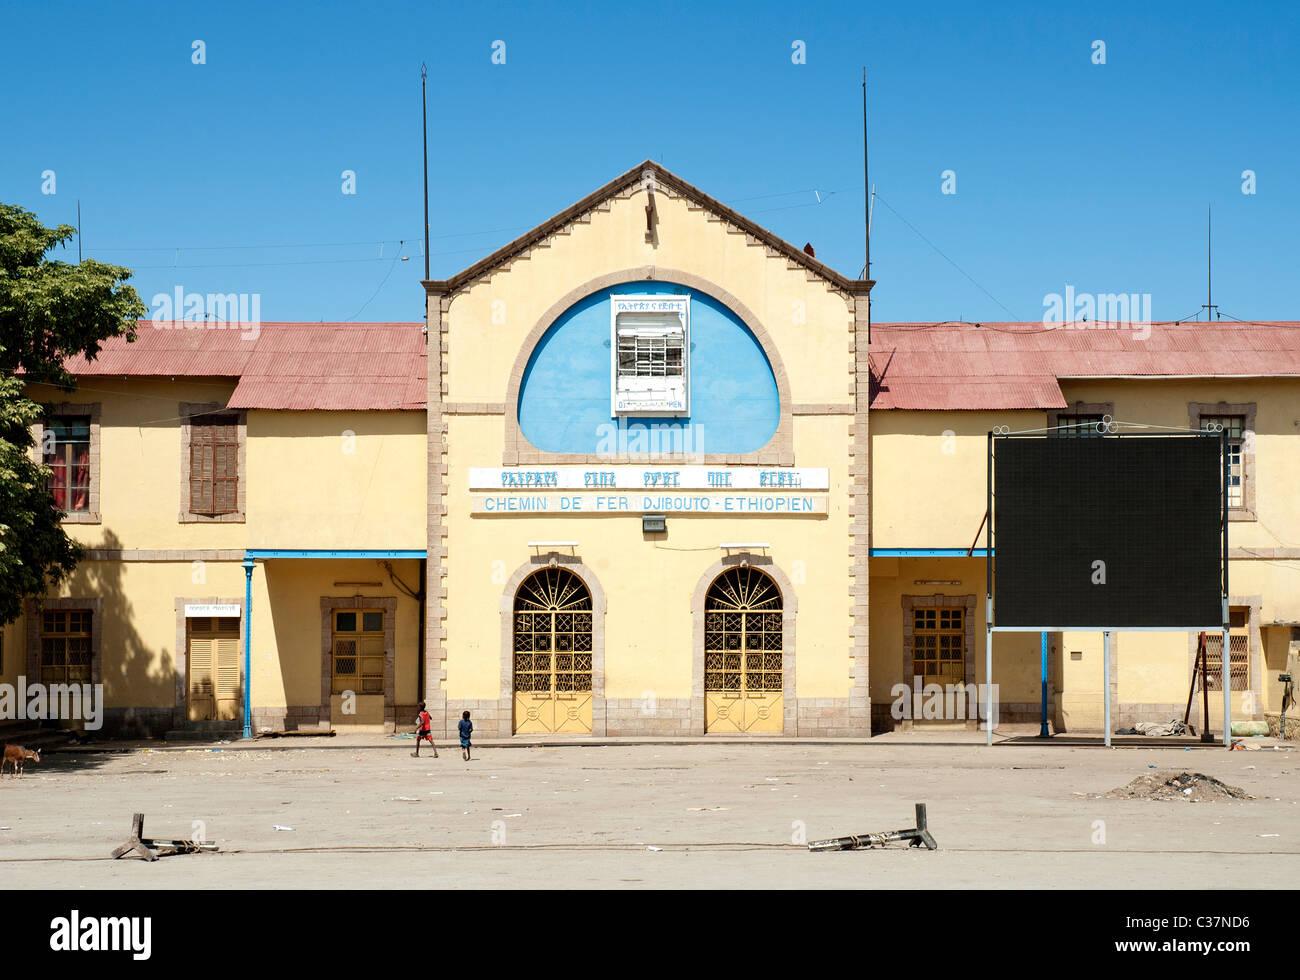 ethiopia to djibouti railway station in dire dawa ethiopia - Stock Image